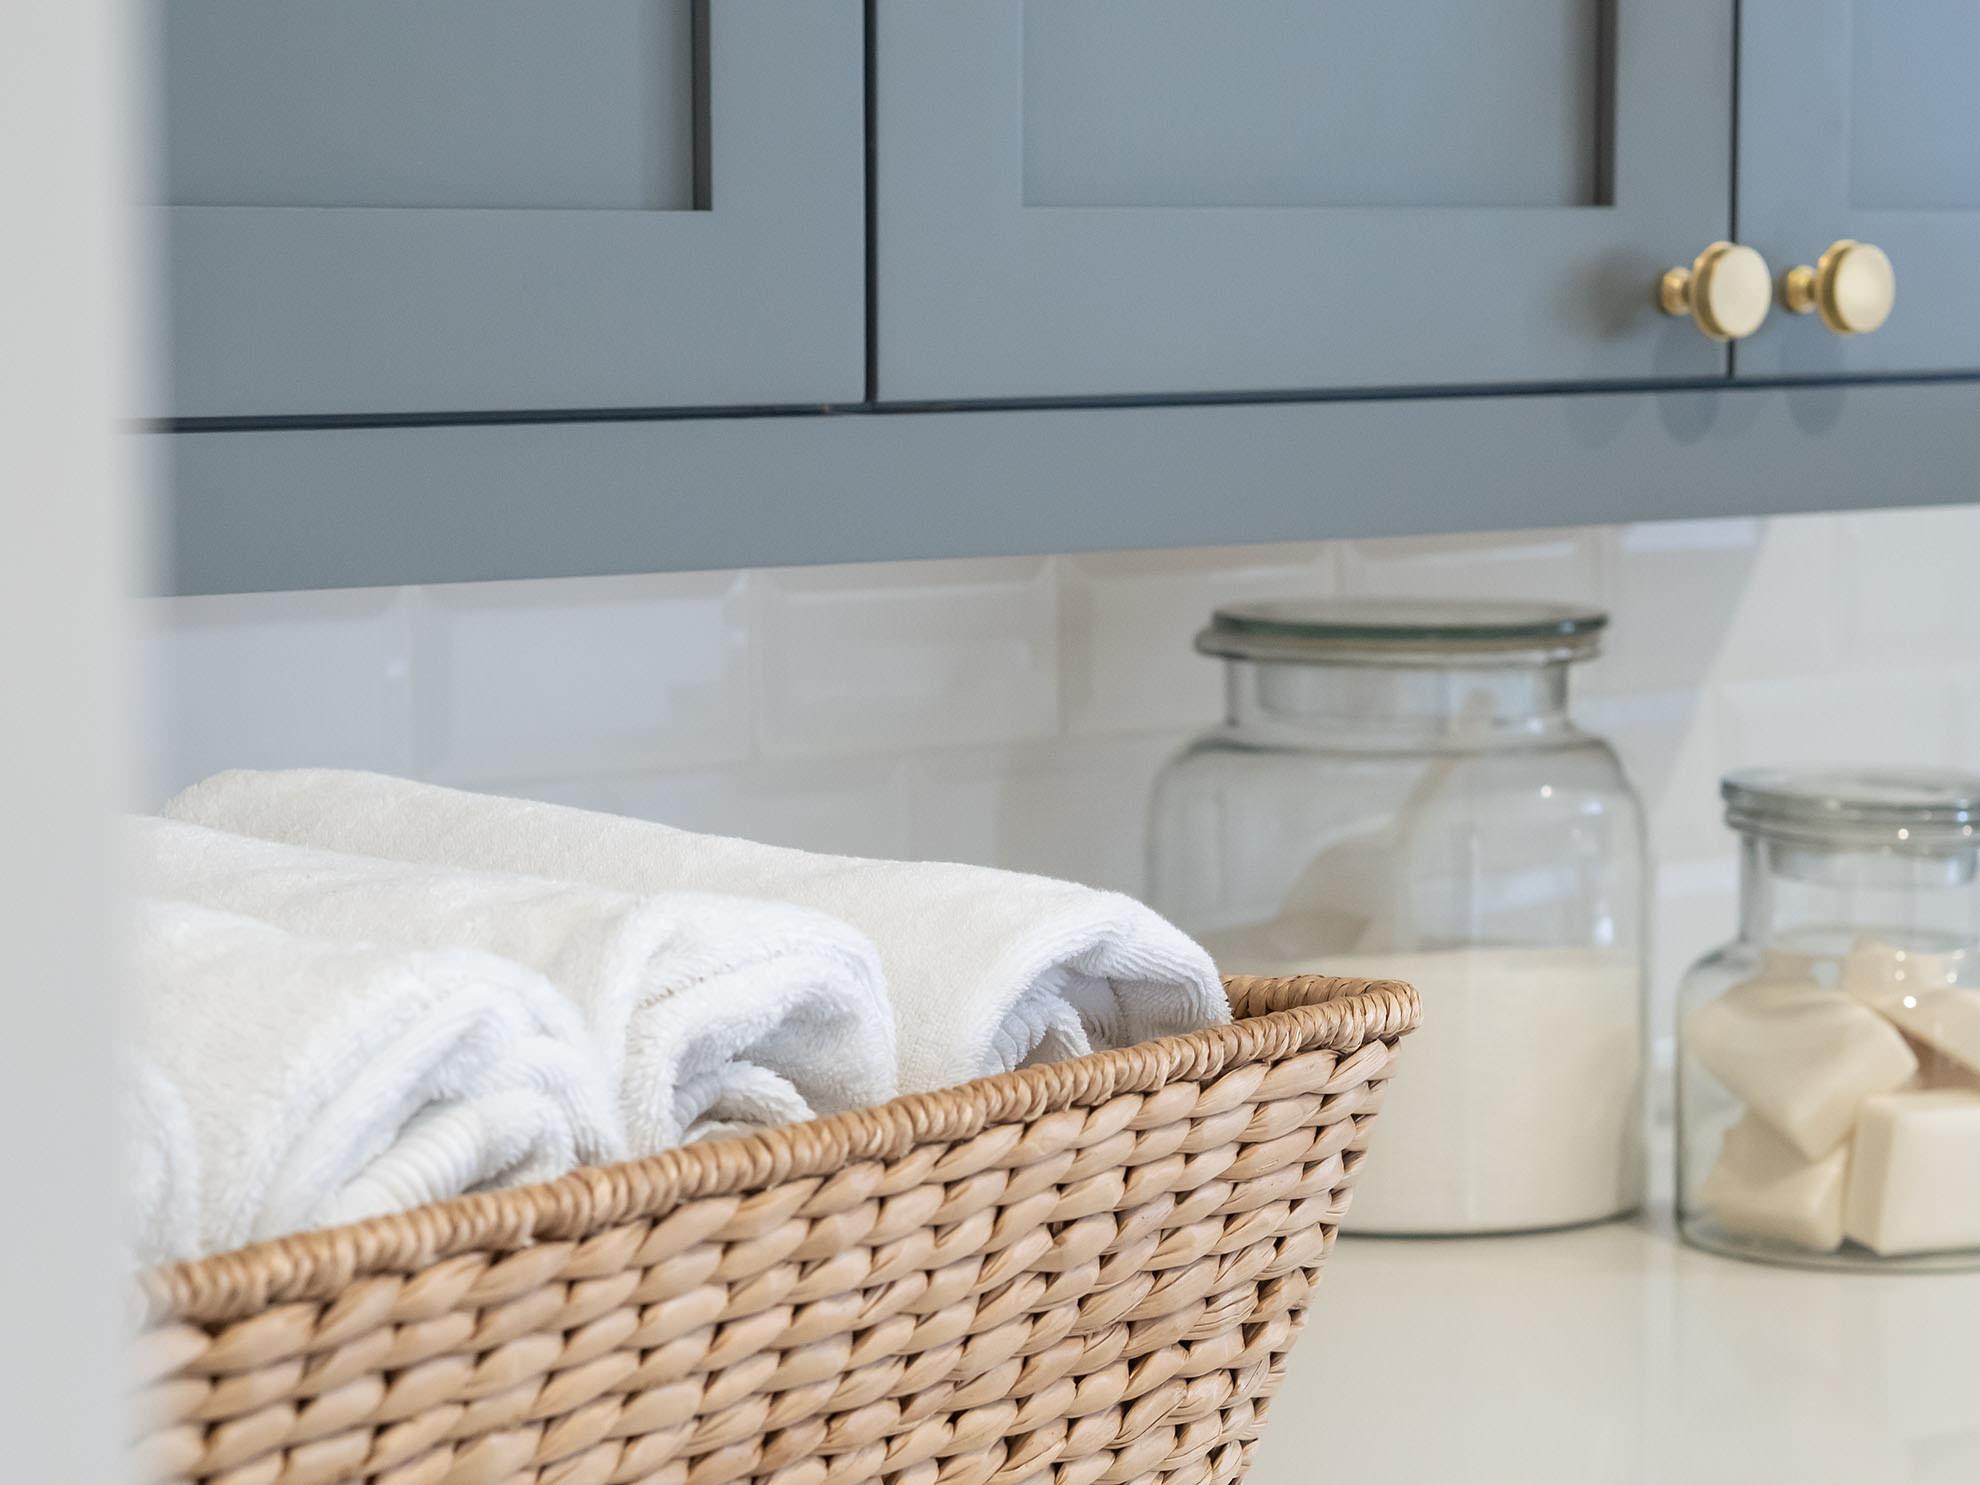 tnd-laundry-1010106.jpg